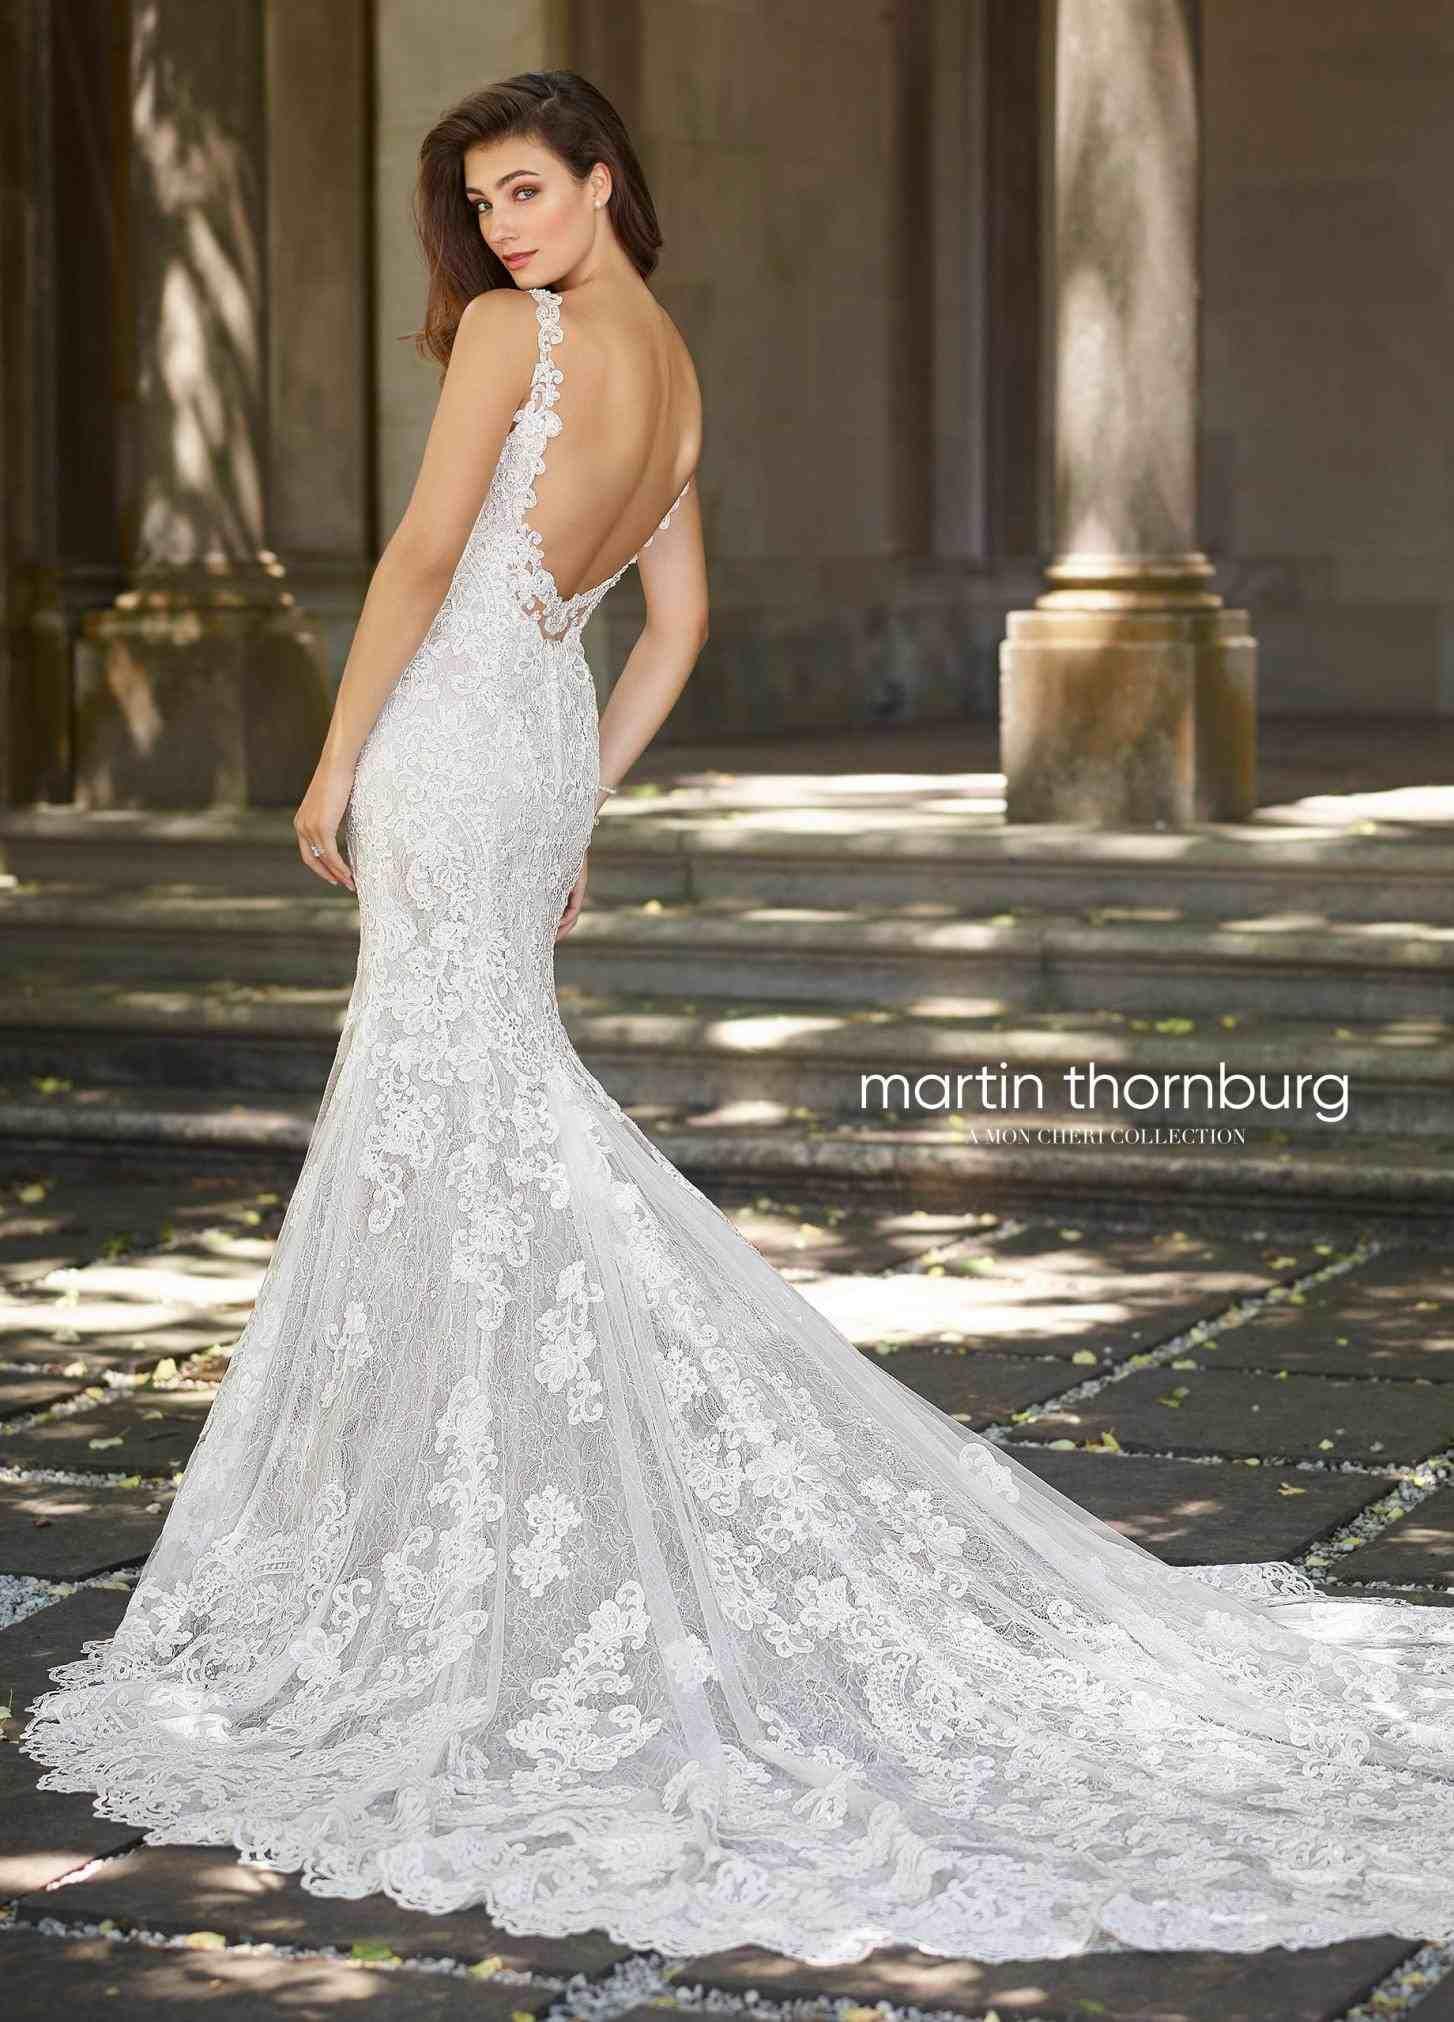 Open back wedding dresses lace  lace wedding dress low open back  Weddings  Pinterest  Lace